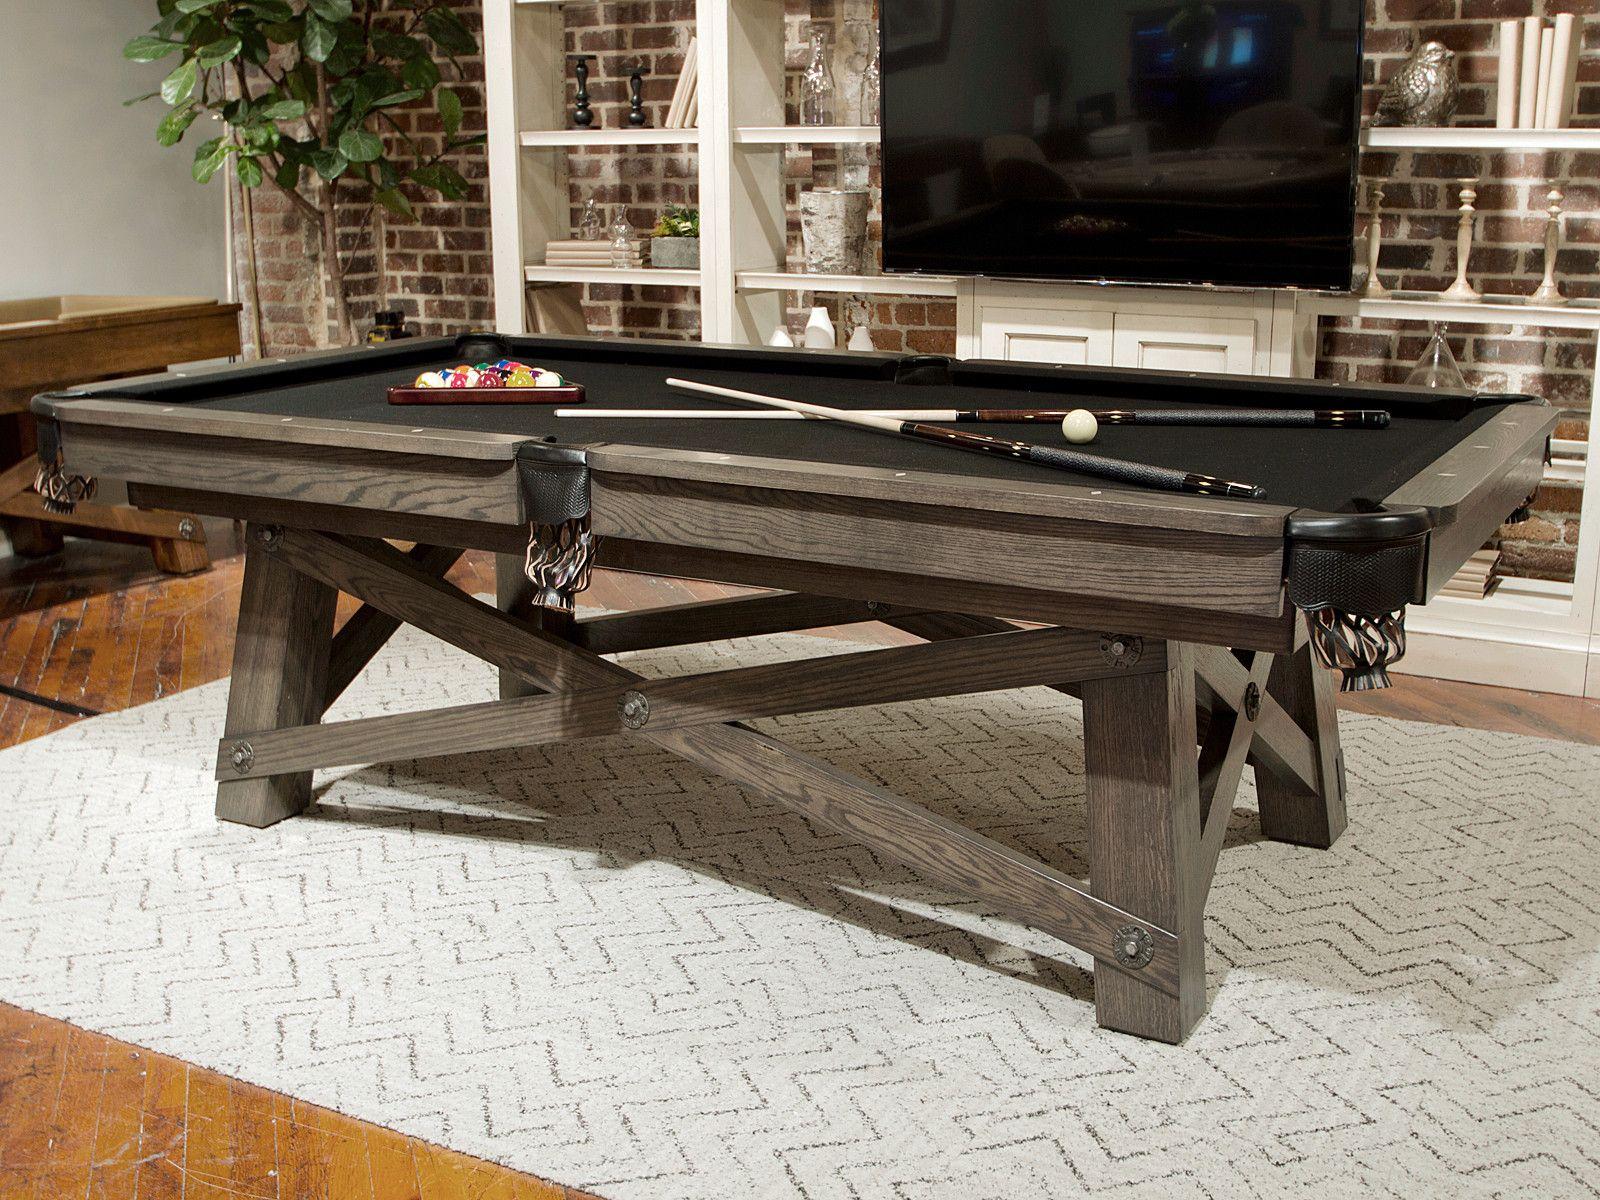 California House Loft Pool Table Pool Table Pool Table Room Shuffleboard Table